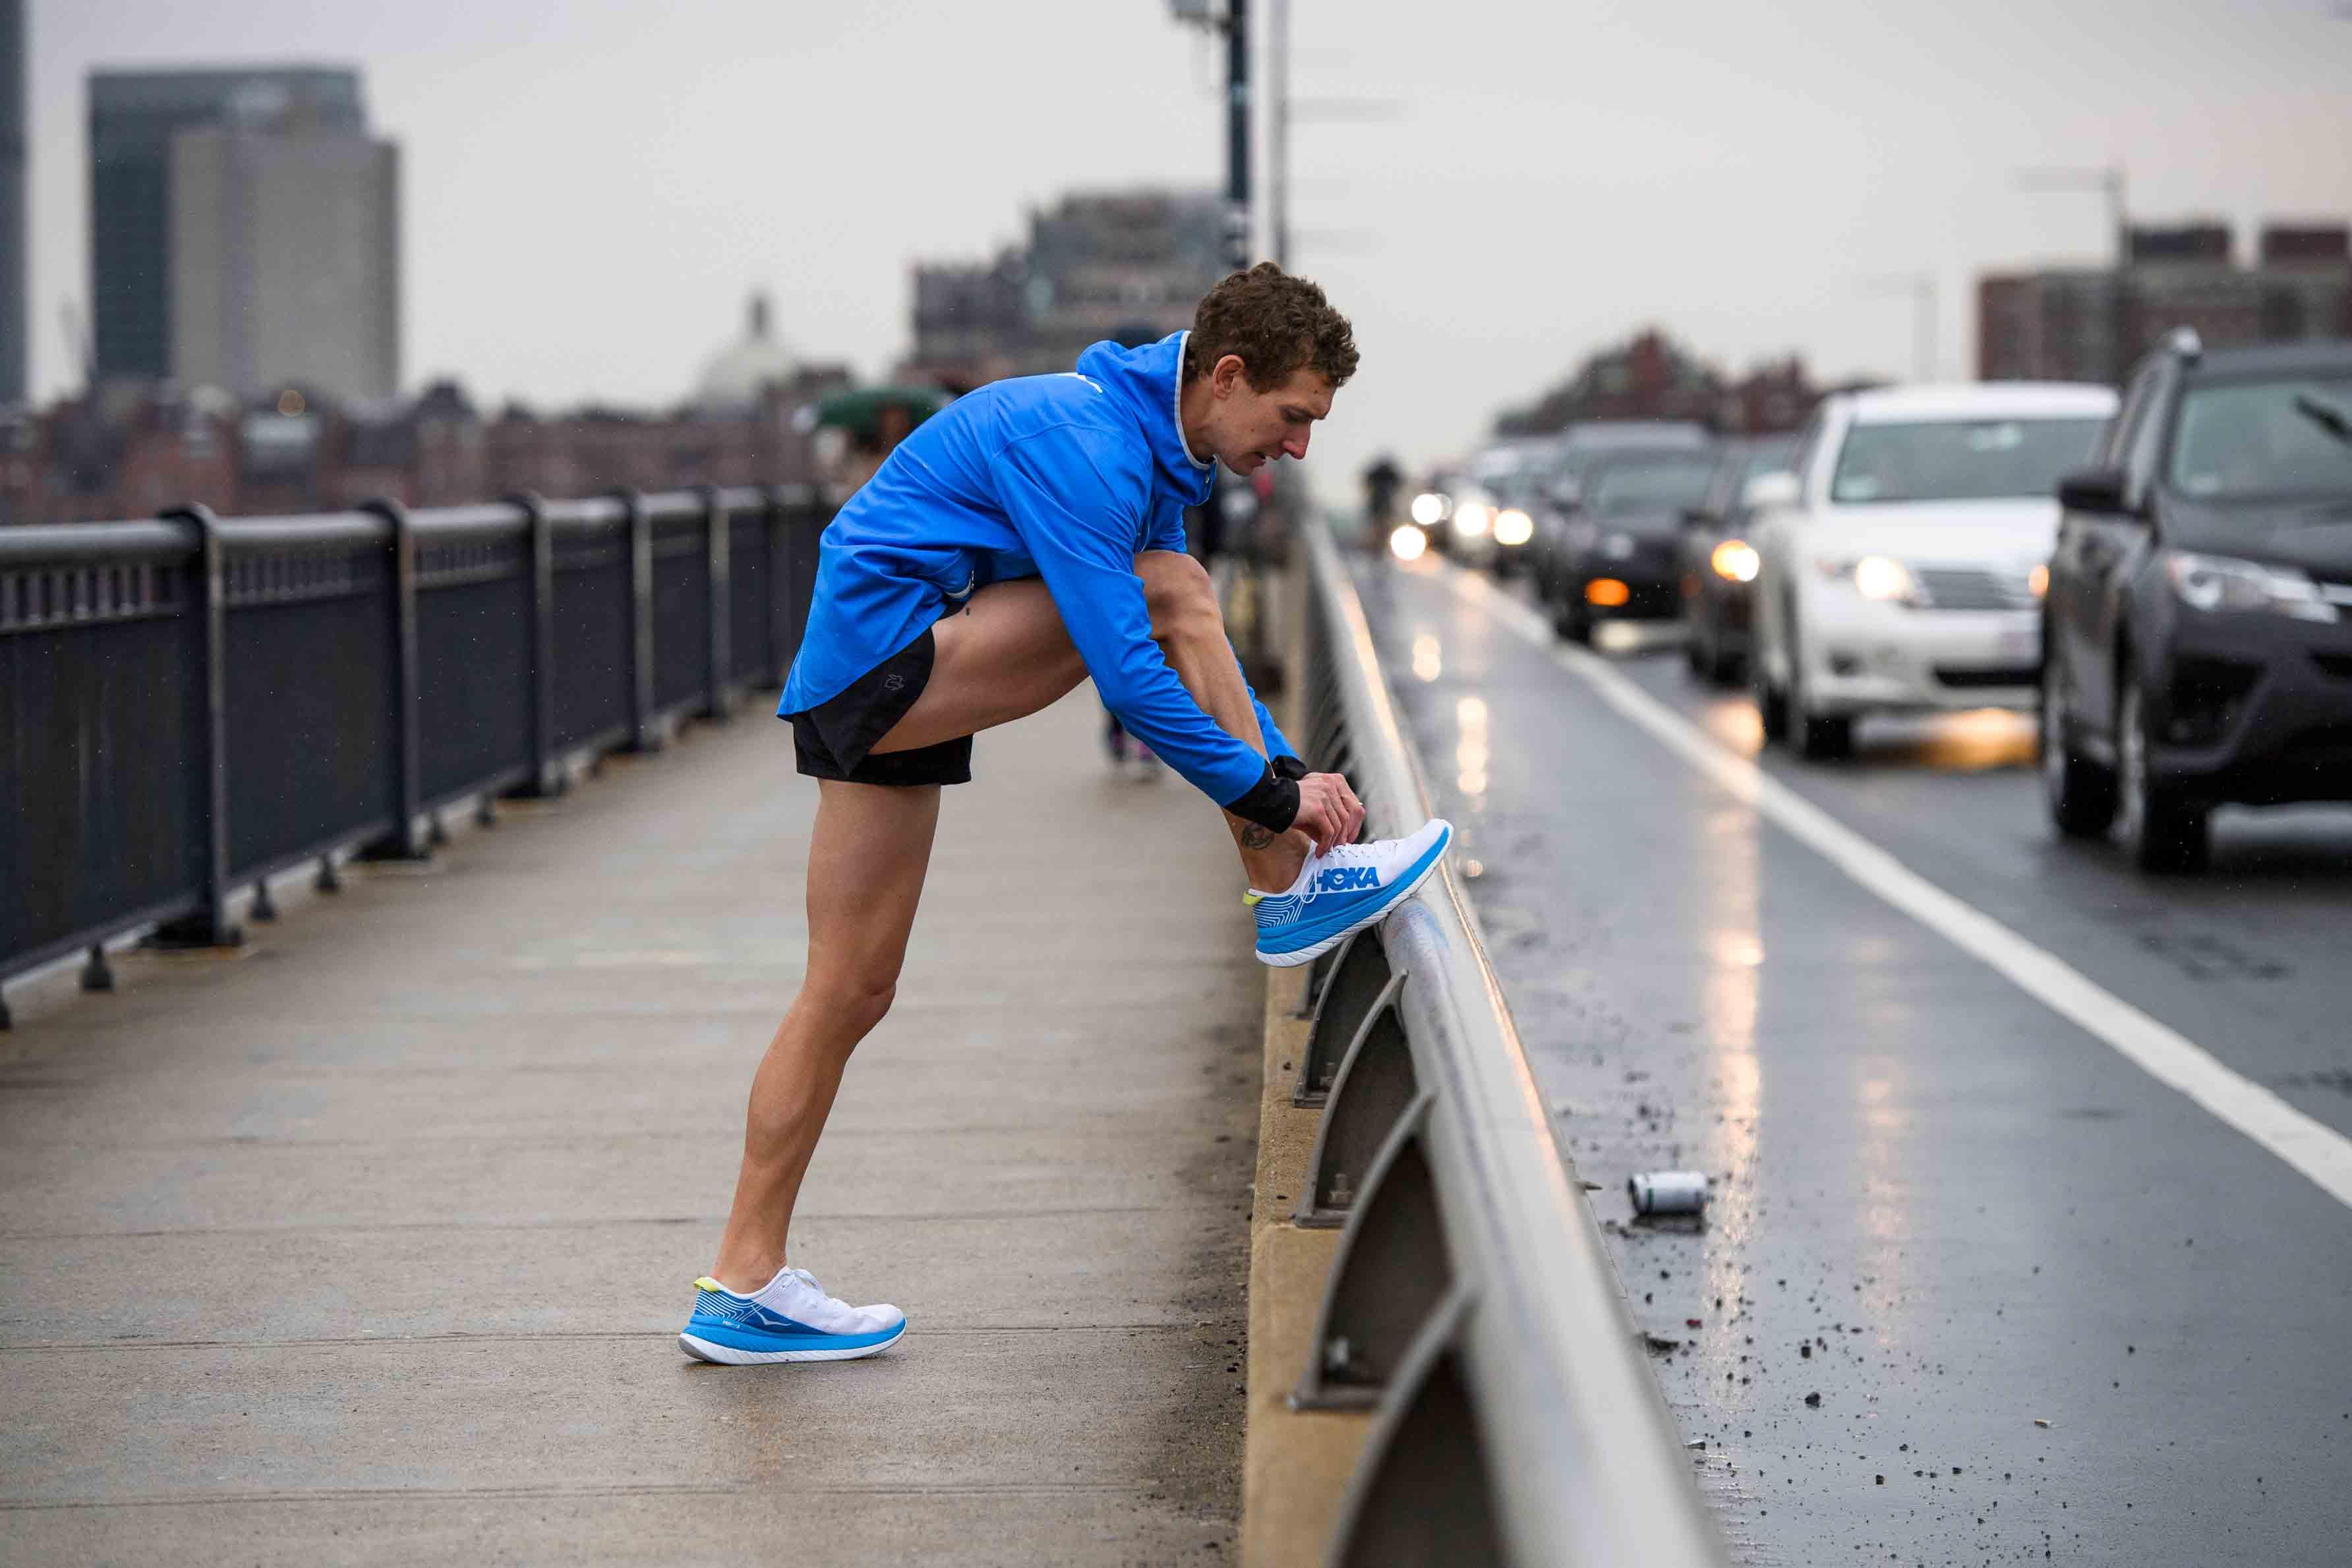 Training on Track: HOKA Athlete Tyler Andrew's Berlin Marathon Workout